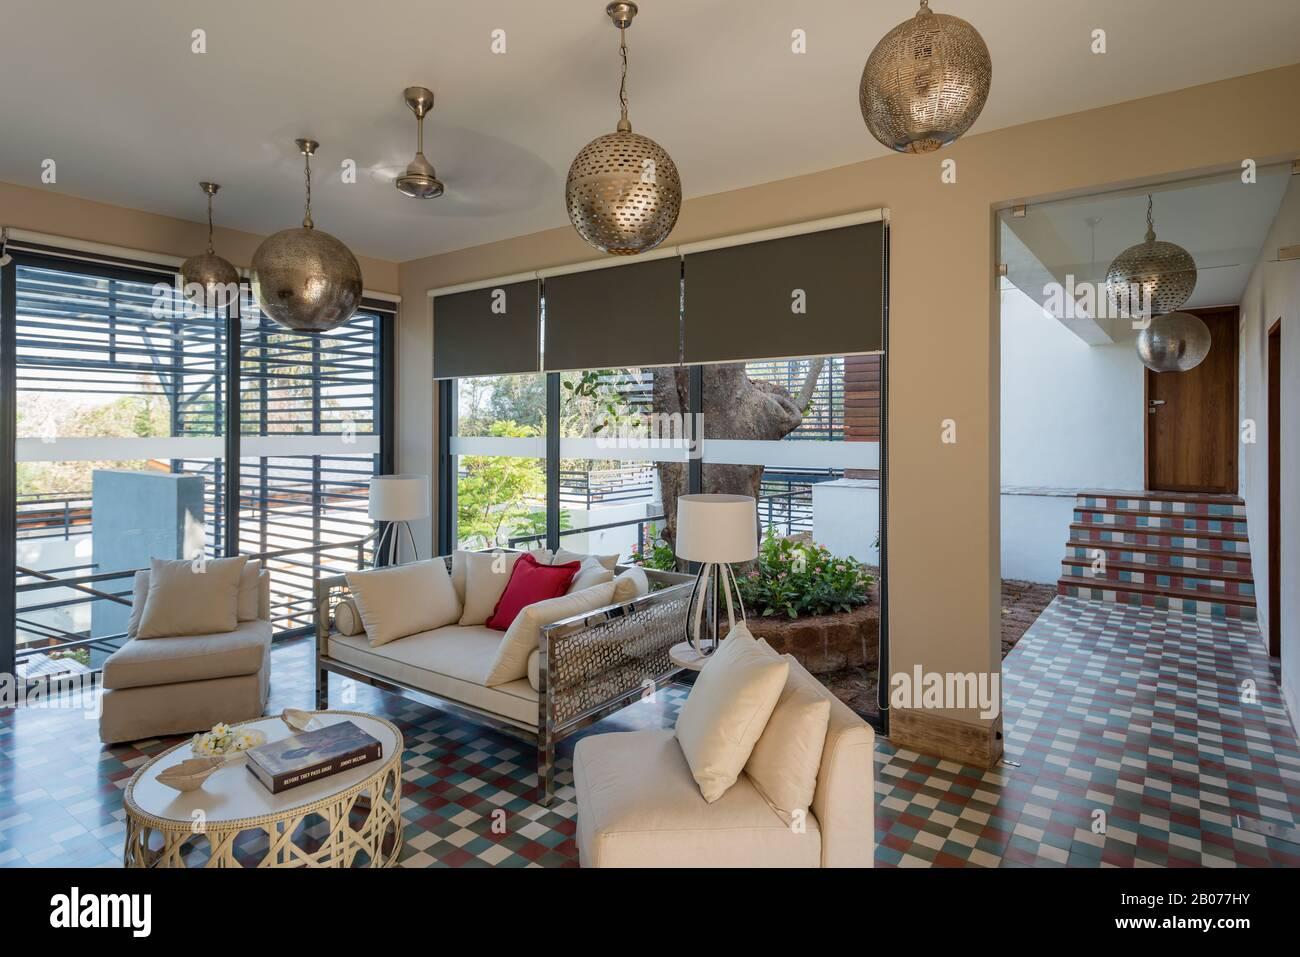 Arabic Style Living Room Stock Photo Alamy